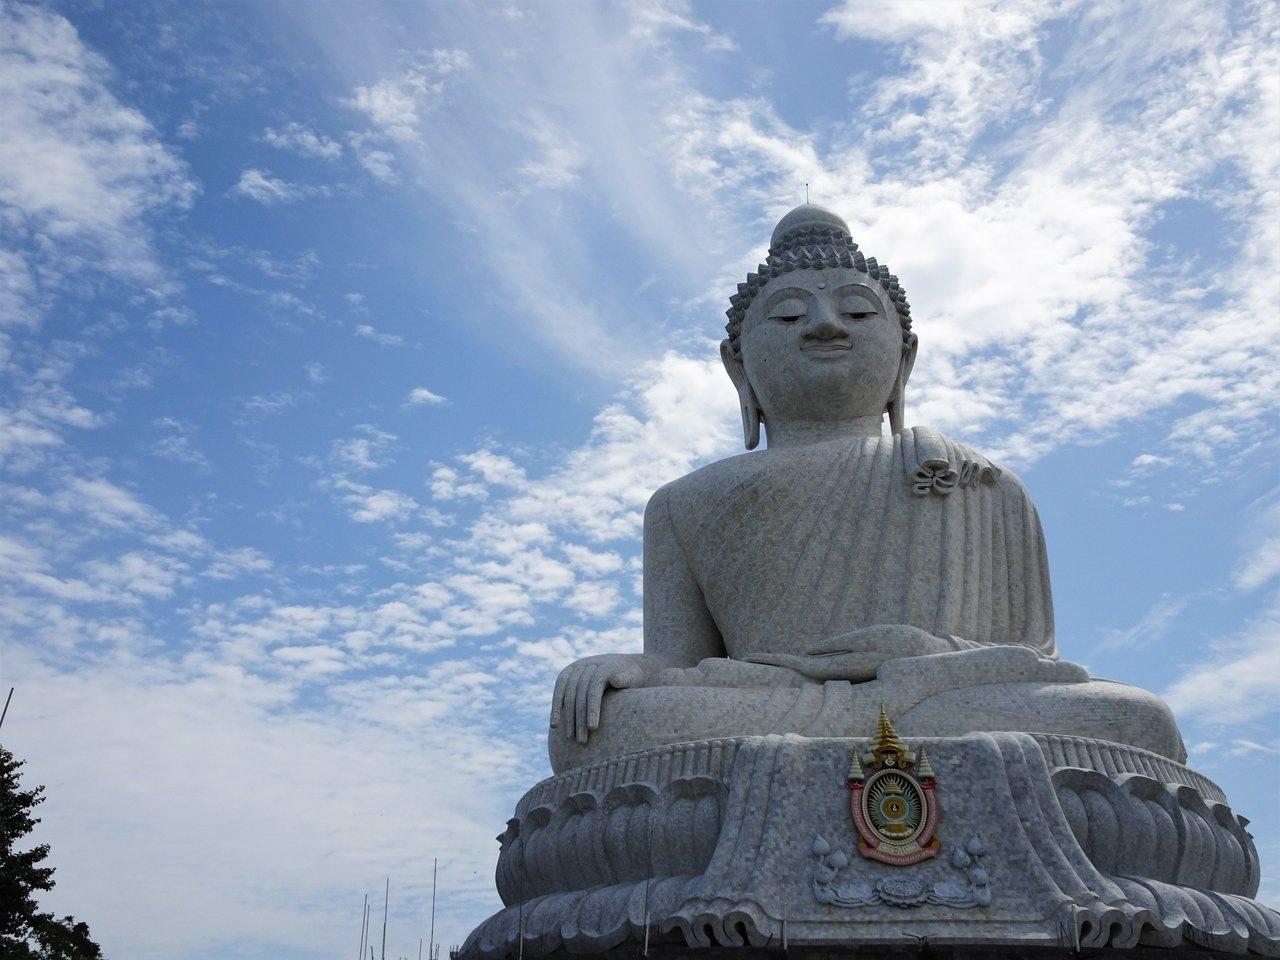 Big Buddha overlooking the City